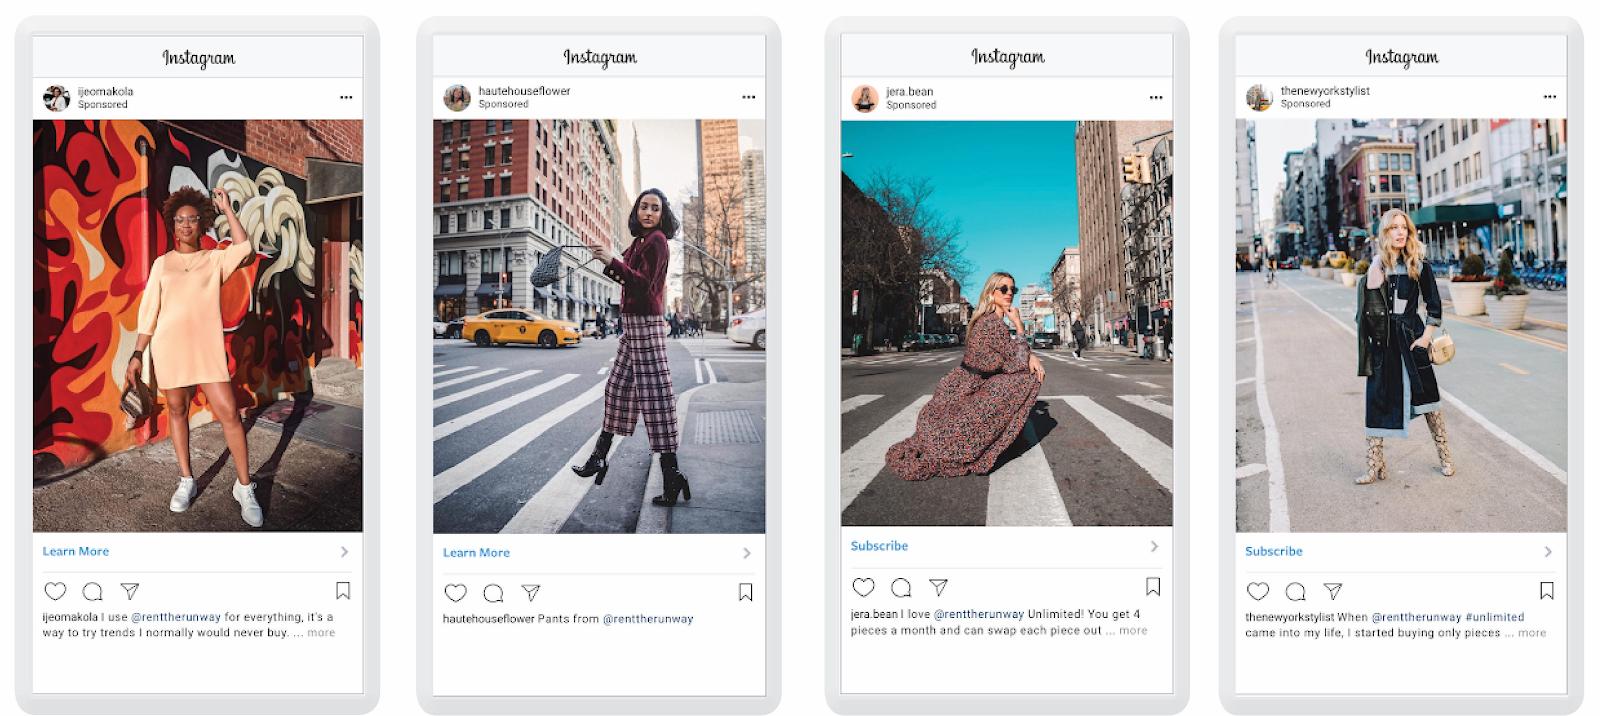 whitelisted influencer instagram ads